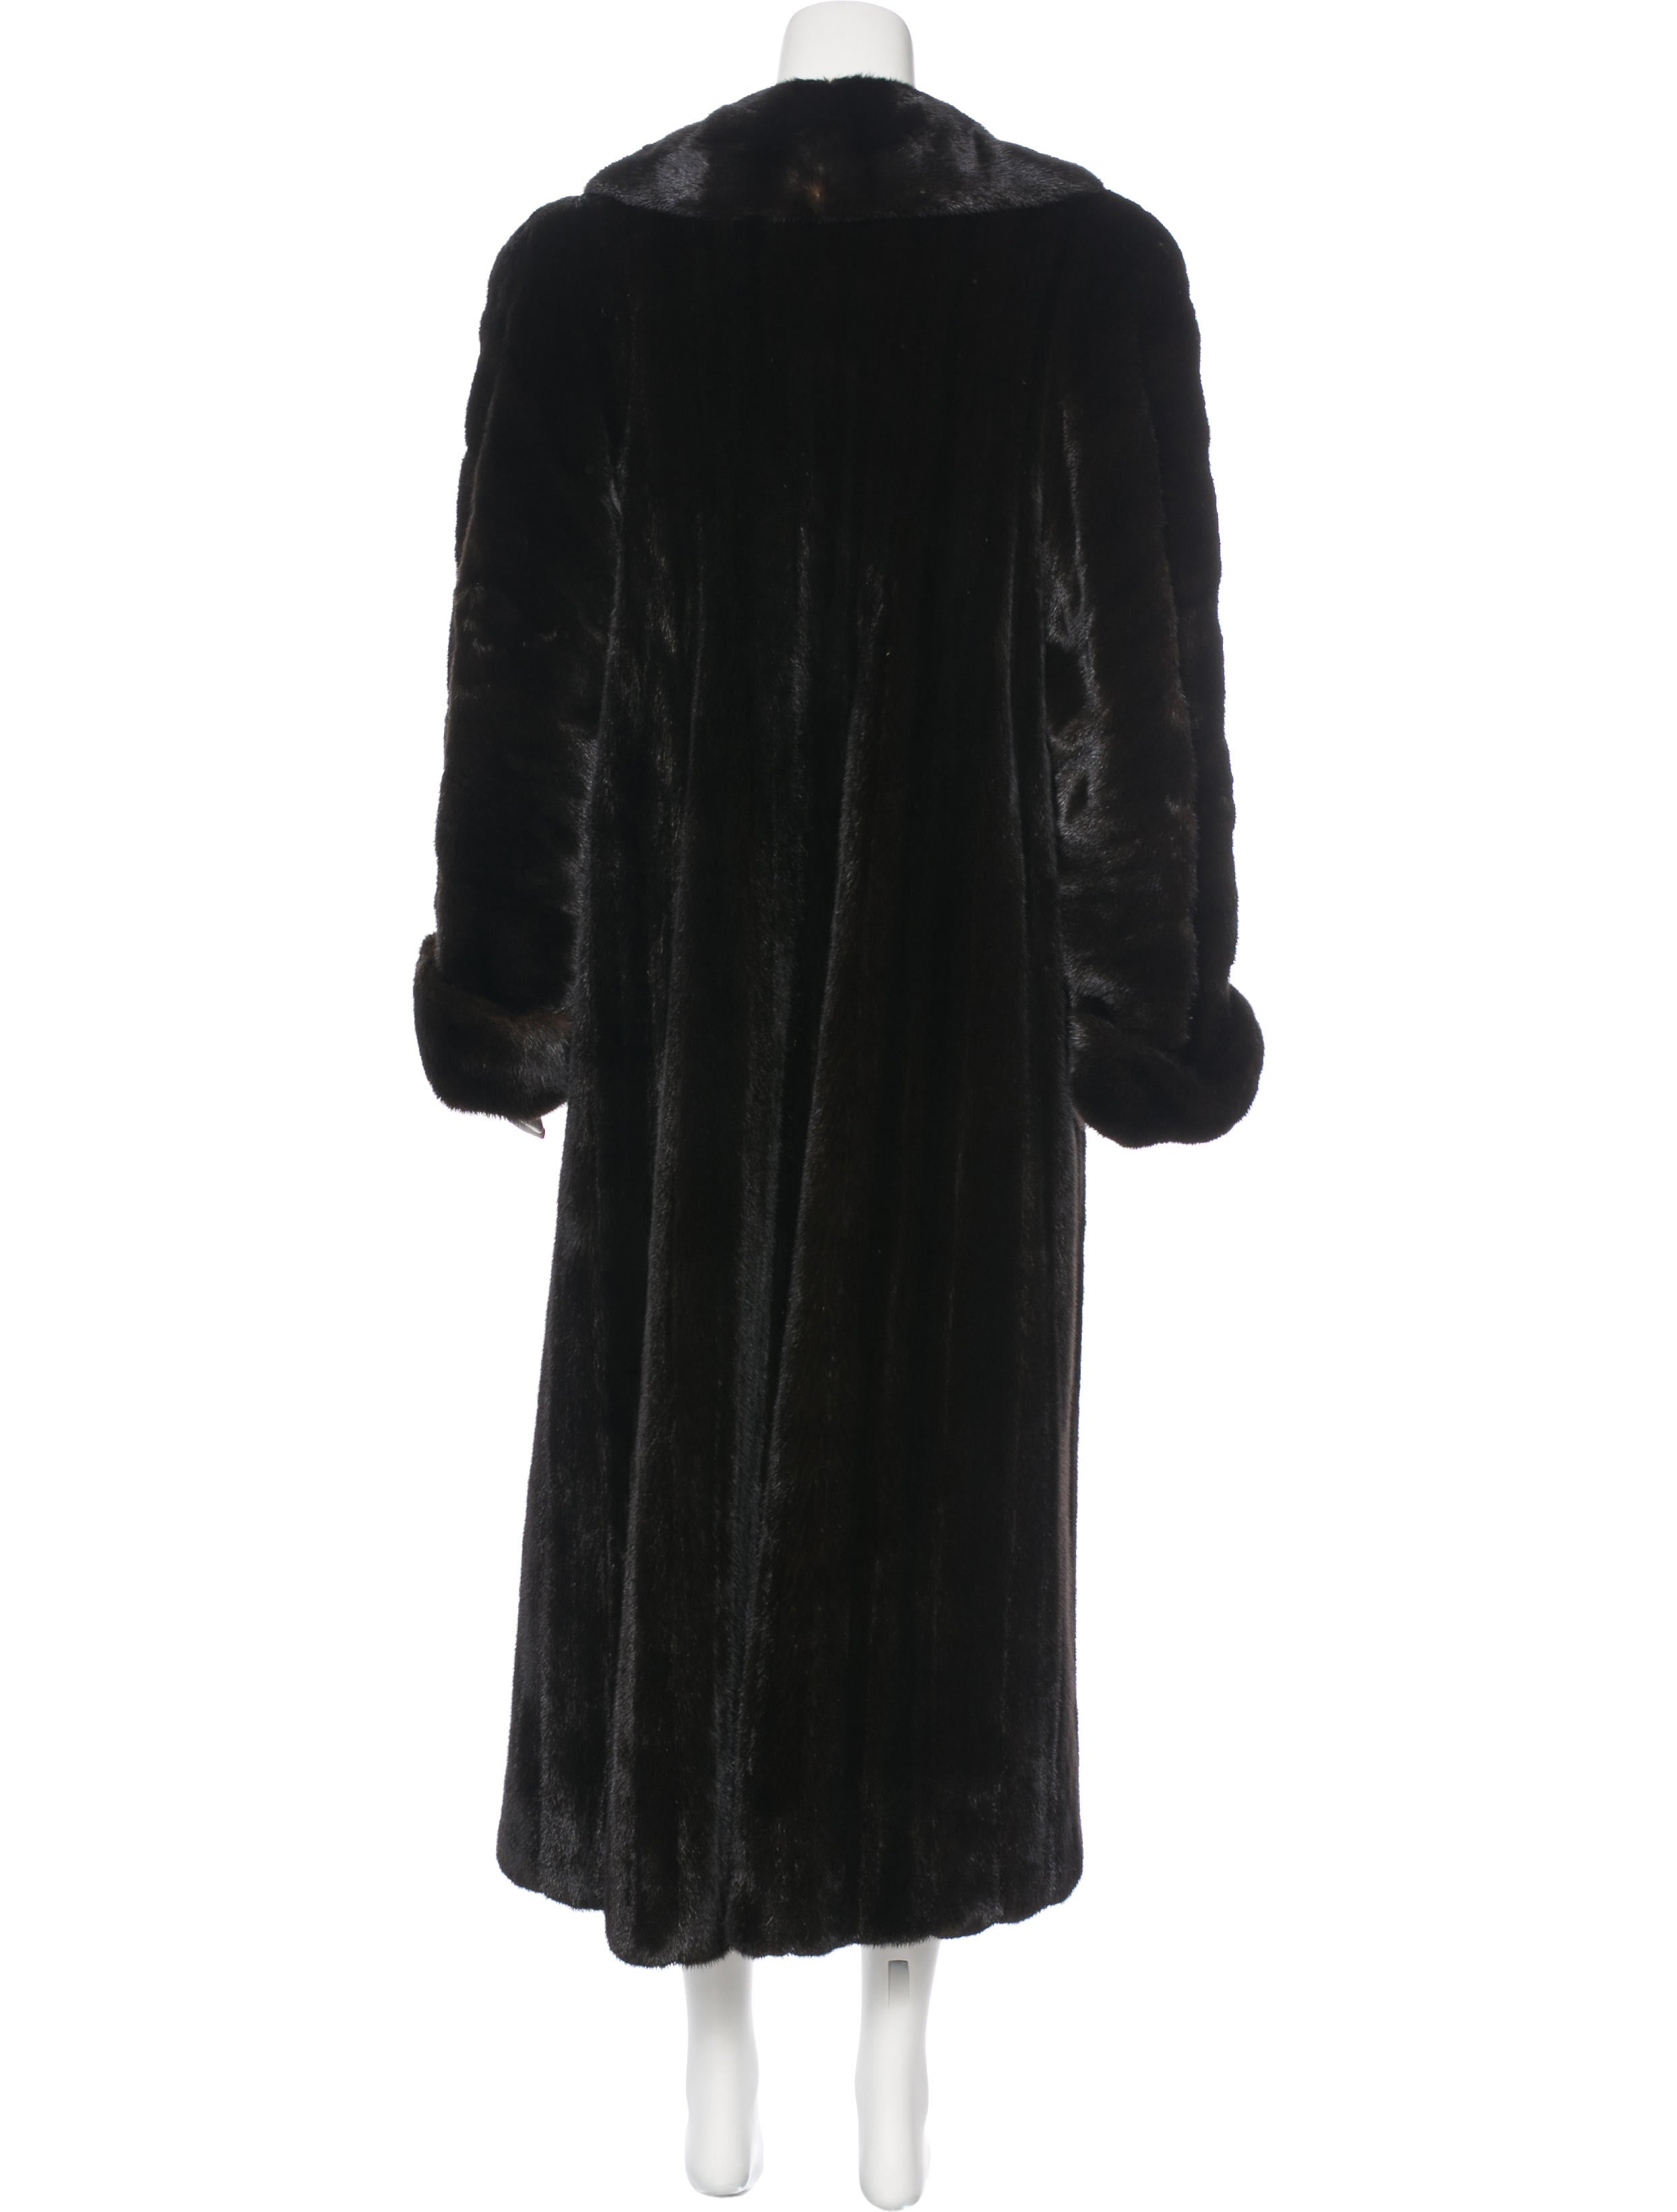 Guy Laroche Mink Fur Coat Clothing Guy20041 The Realreal